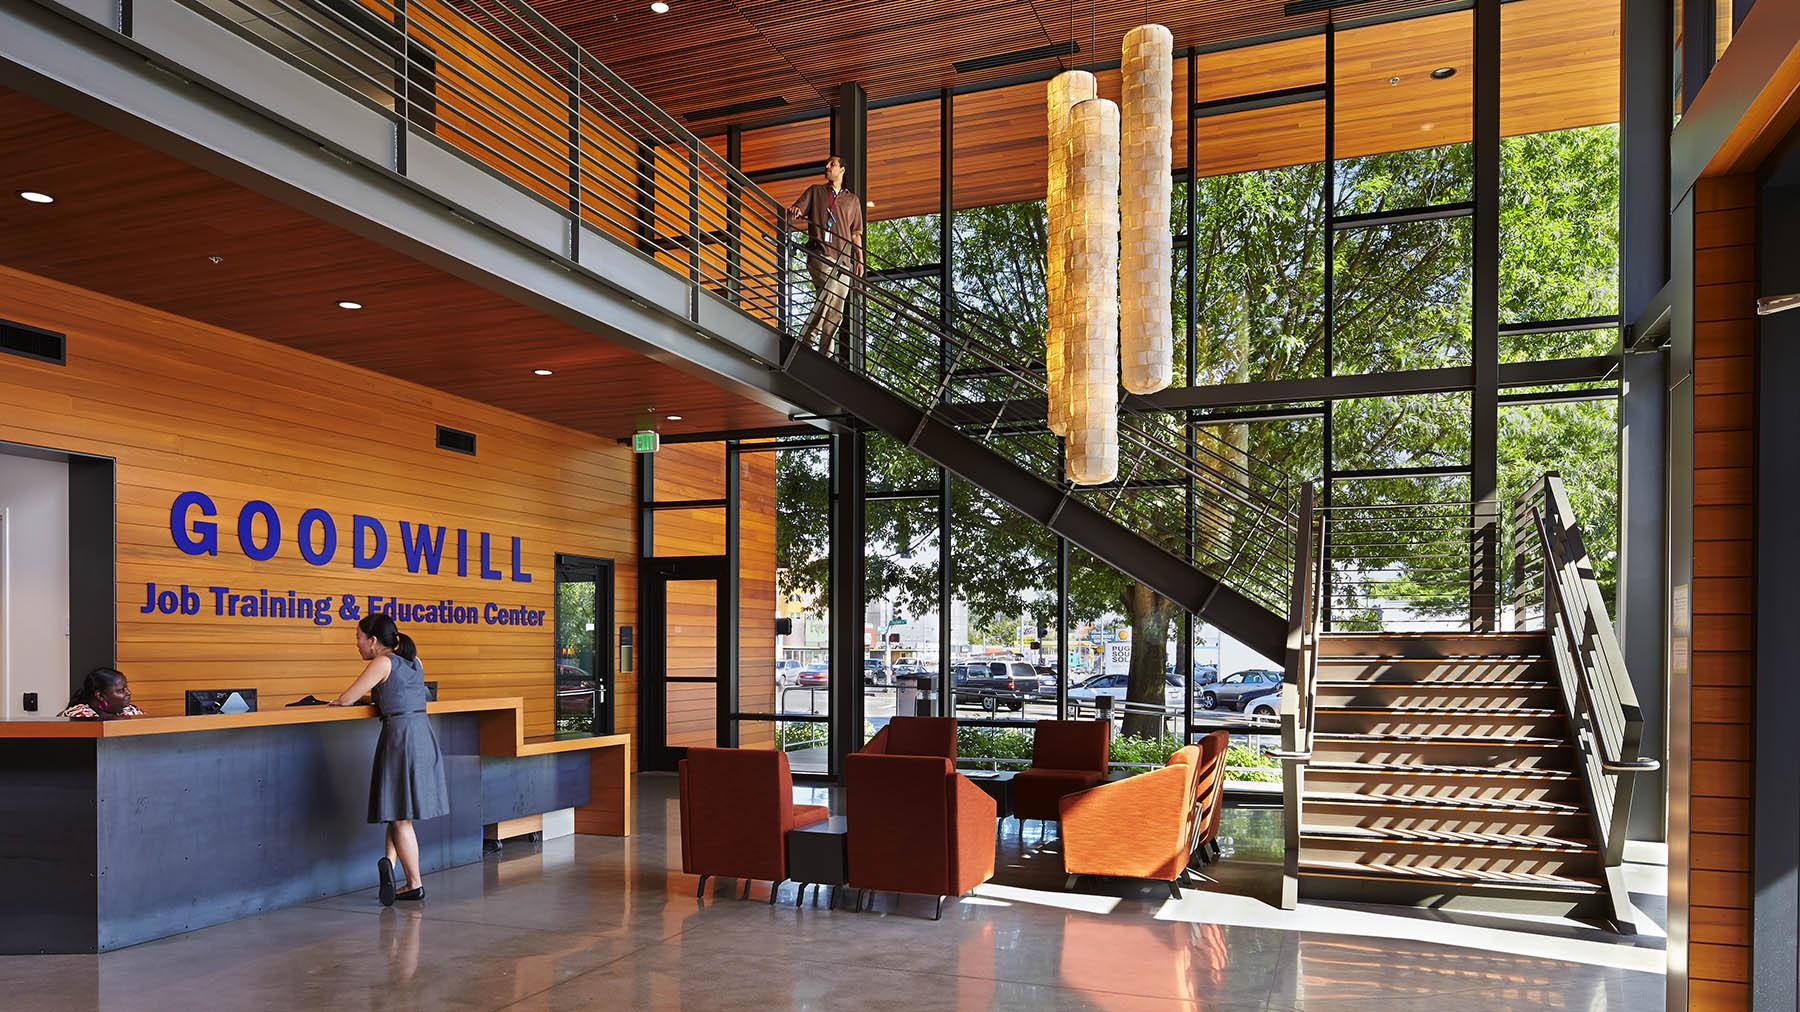 Goodwill Job Training and Education Center, Glumac Building Commissioning